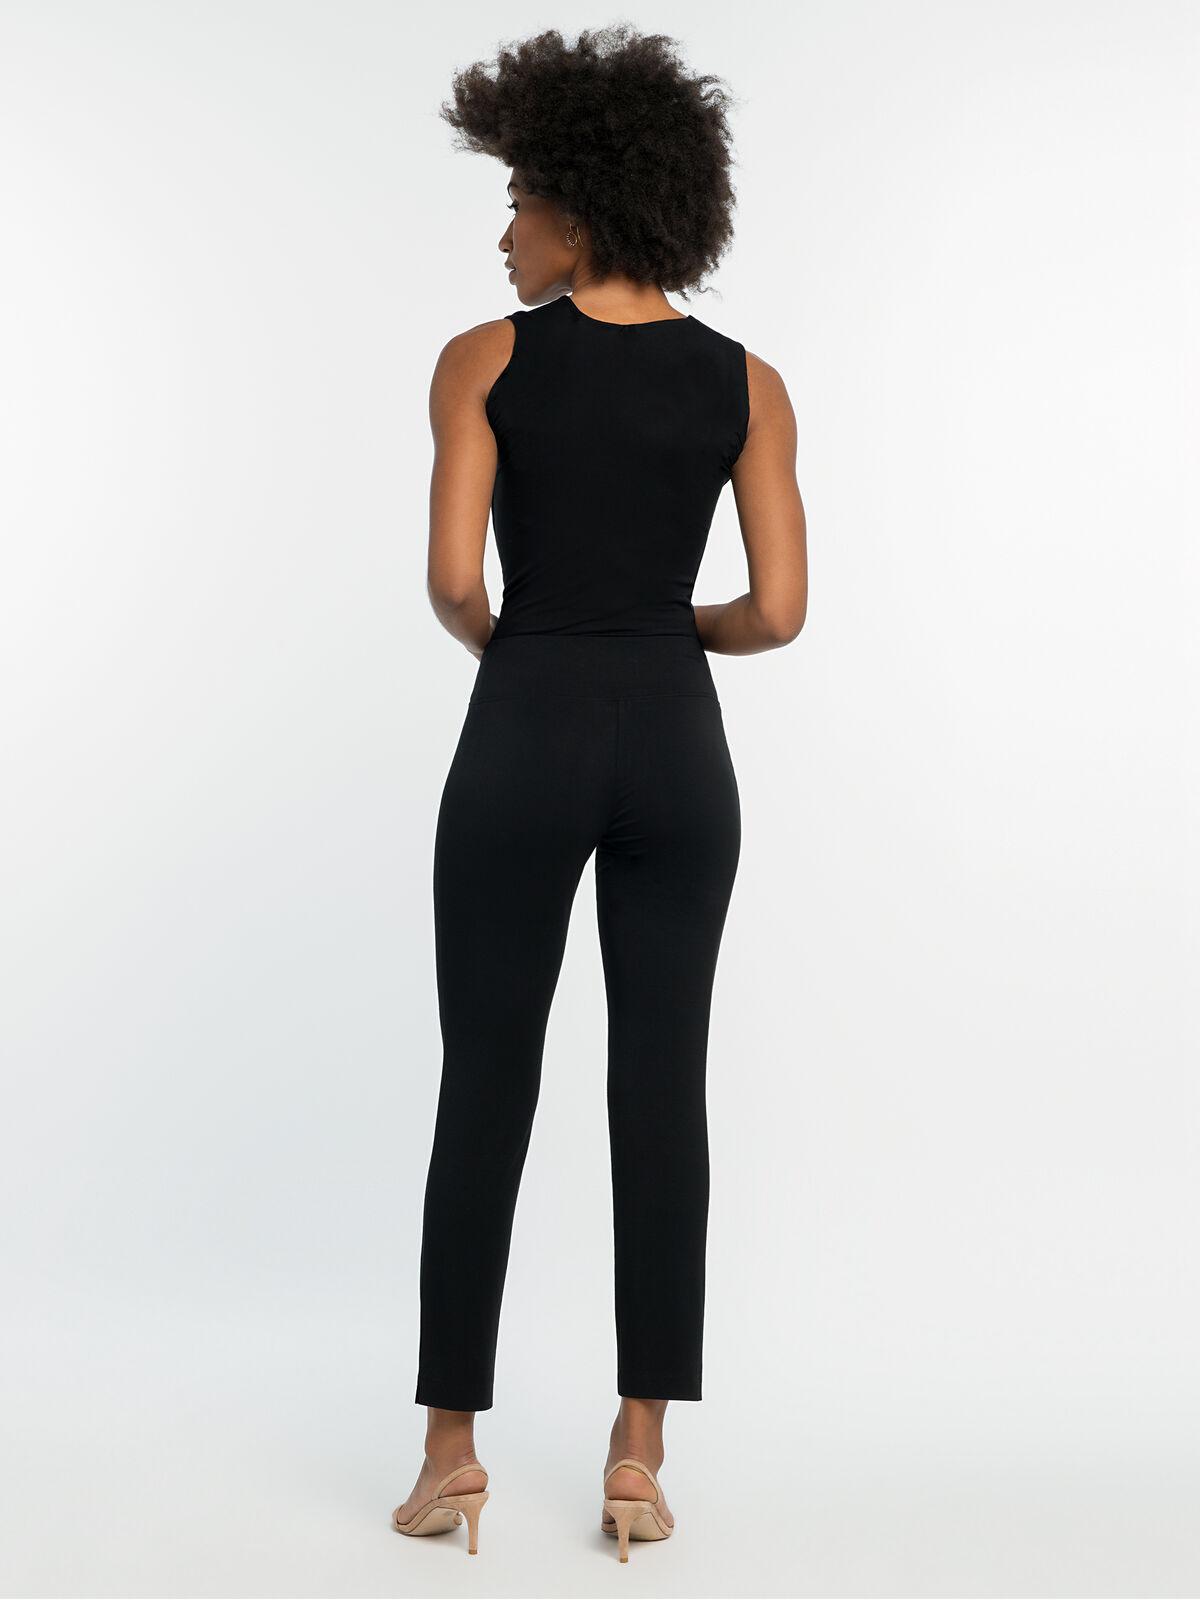 Eaze Slim Pant